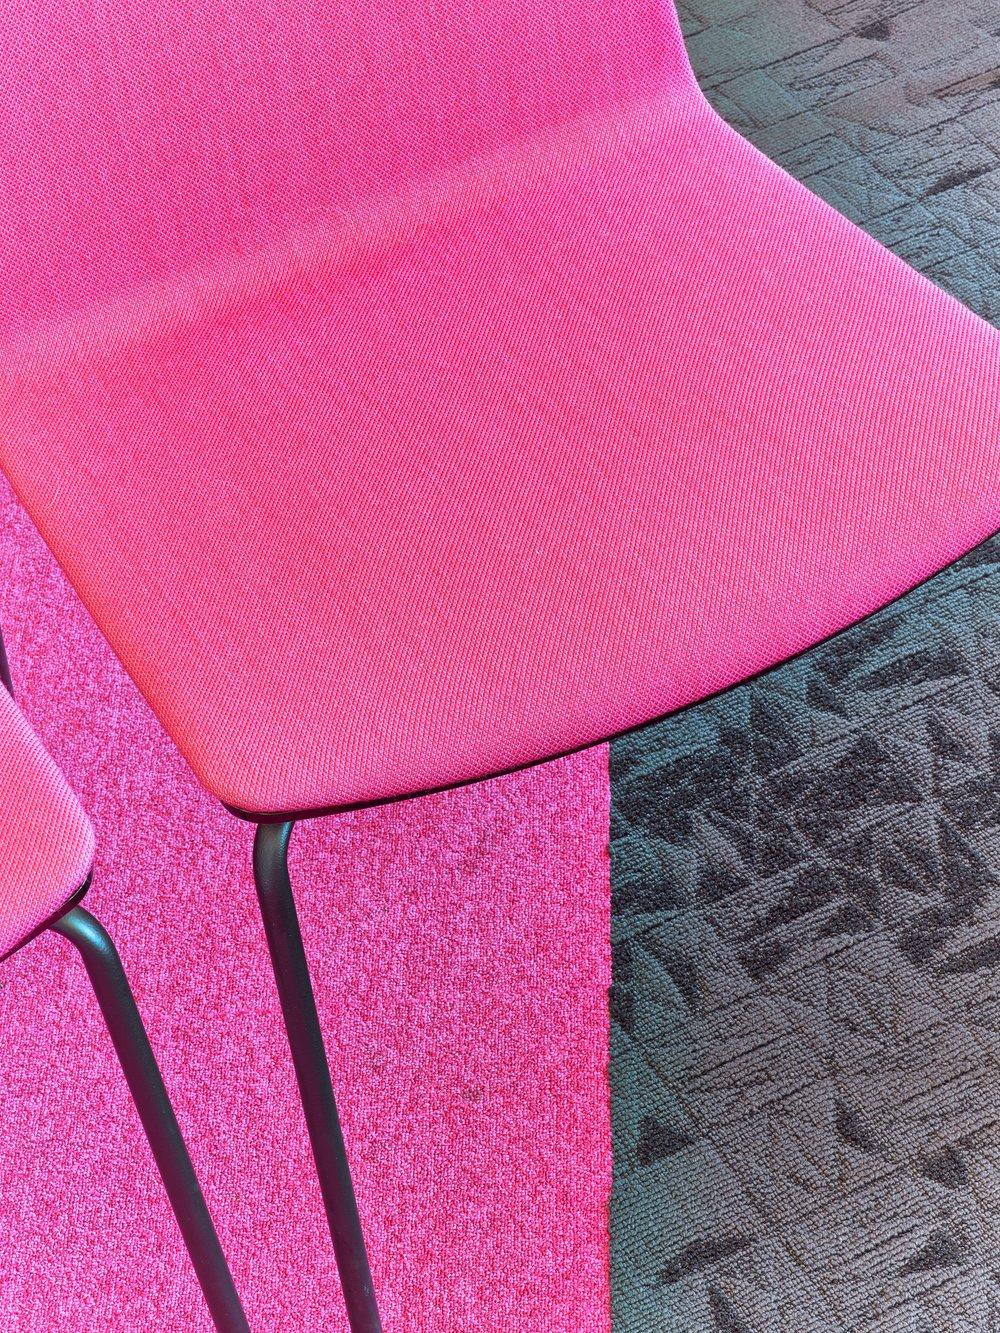 10.5-Accenture rumble pink detail.jpg